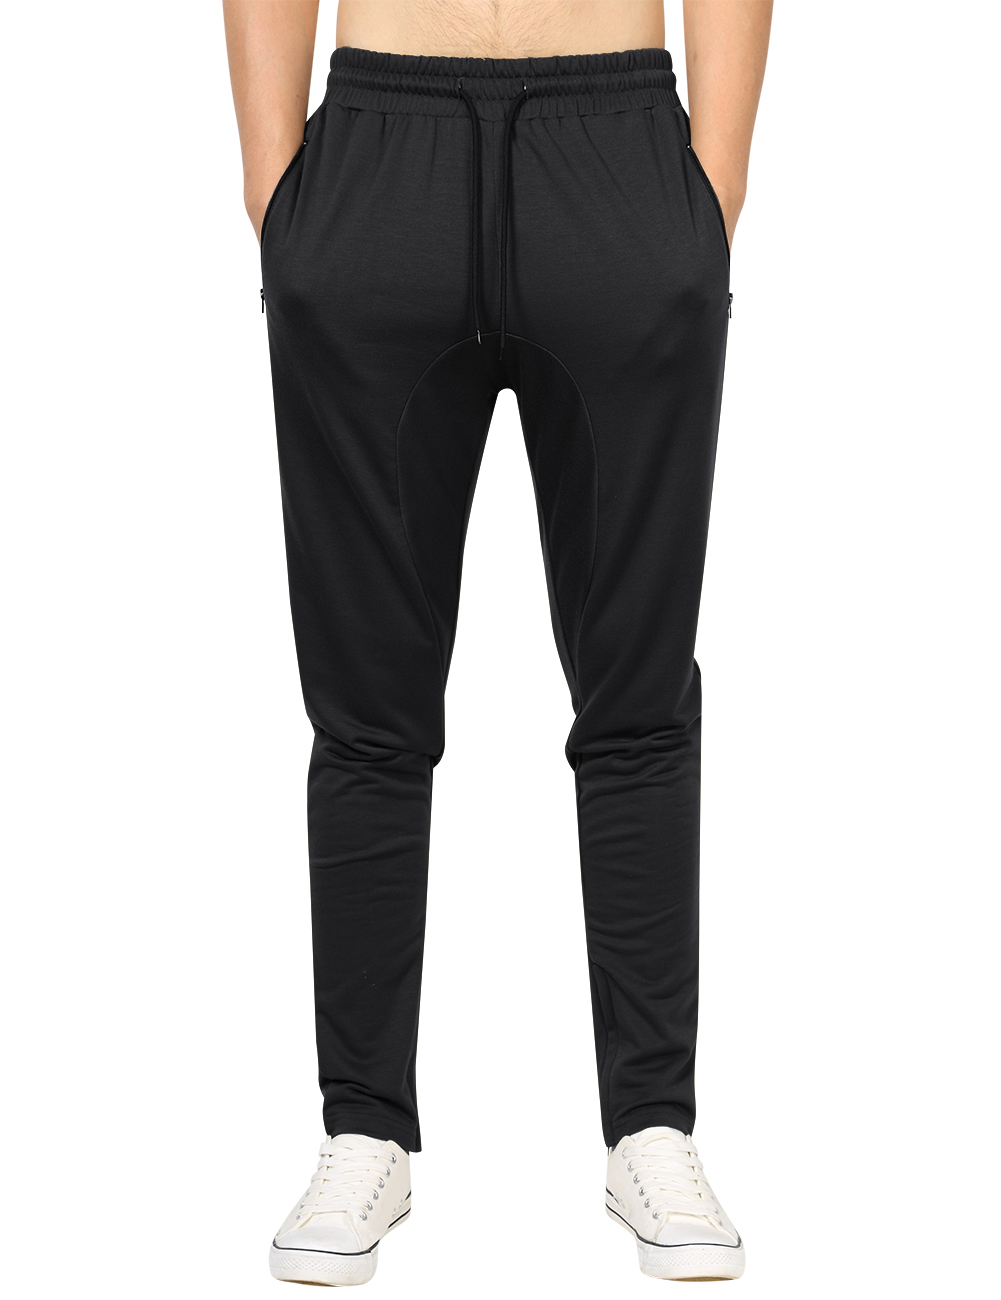 Yong Horse Men's Casual Joggers Slim Fit Ankle Zipper Pocket Drawstring Waist Open Bottoms Sweatpants Black_XL